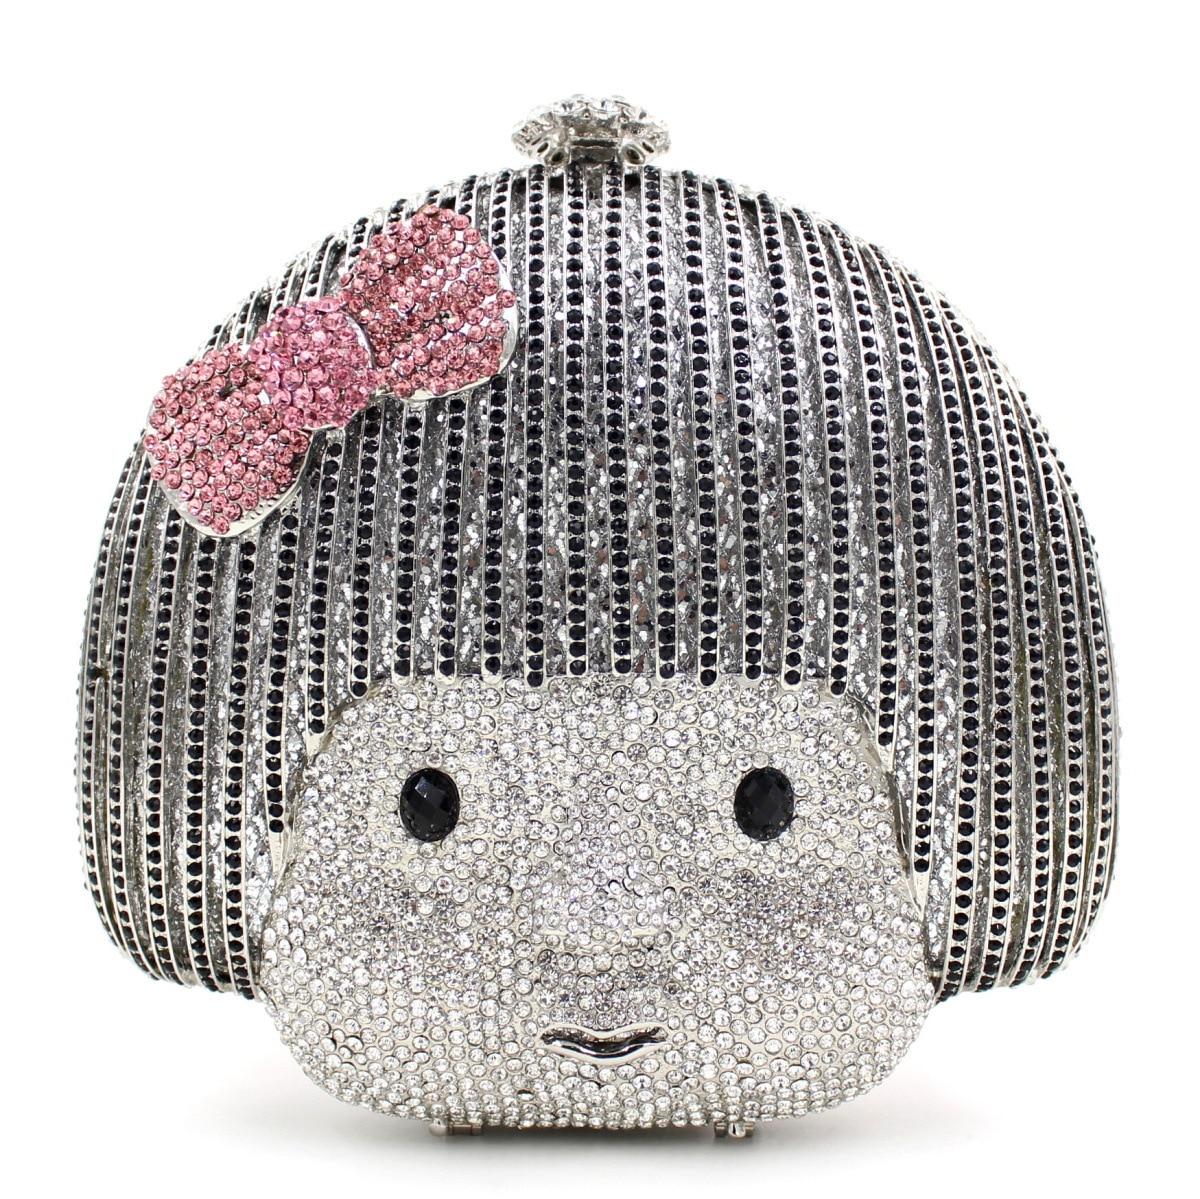 2017 new doll luxury women day clutches bag full diamonds bride wedding party dinner bag handbag handbags purse ladies phone bag